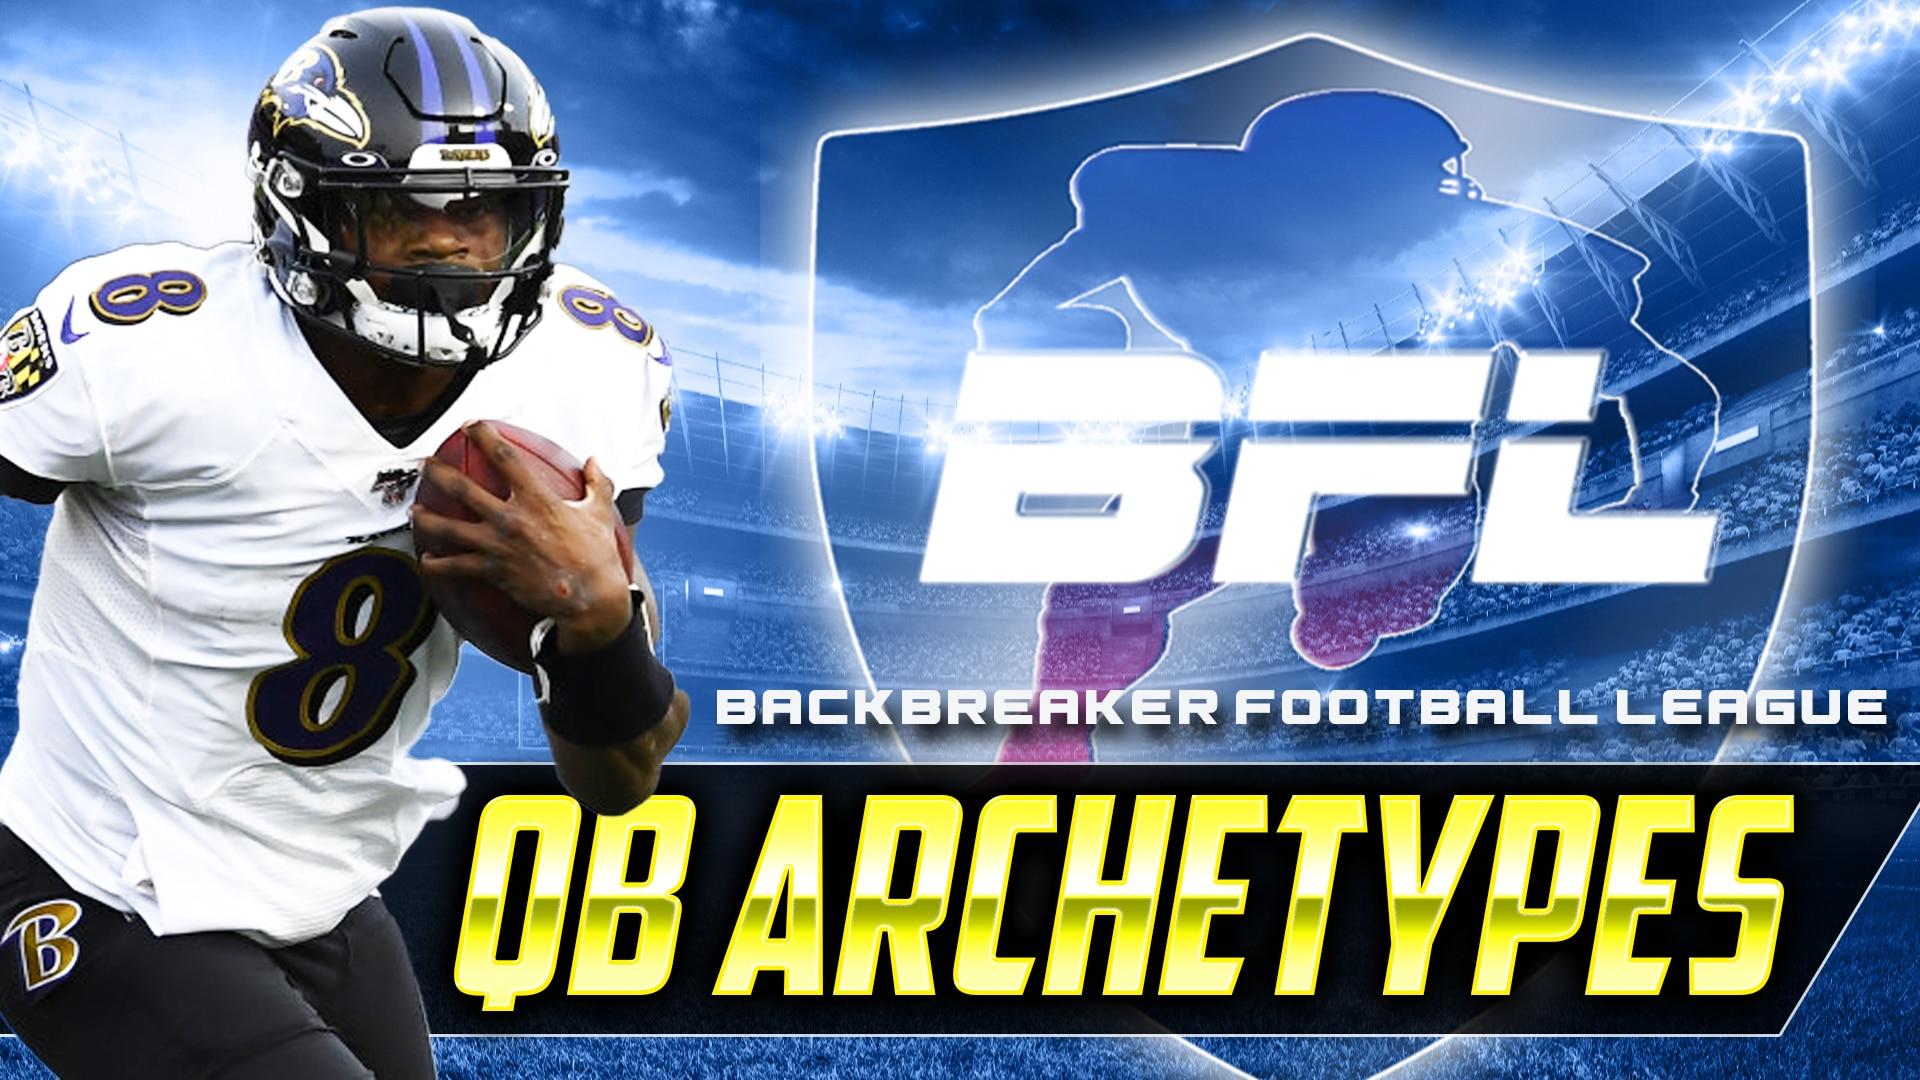 Quarterback Archetypes